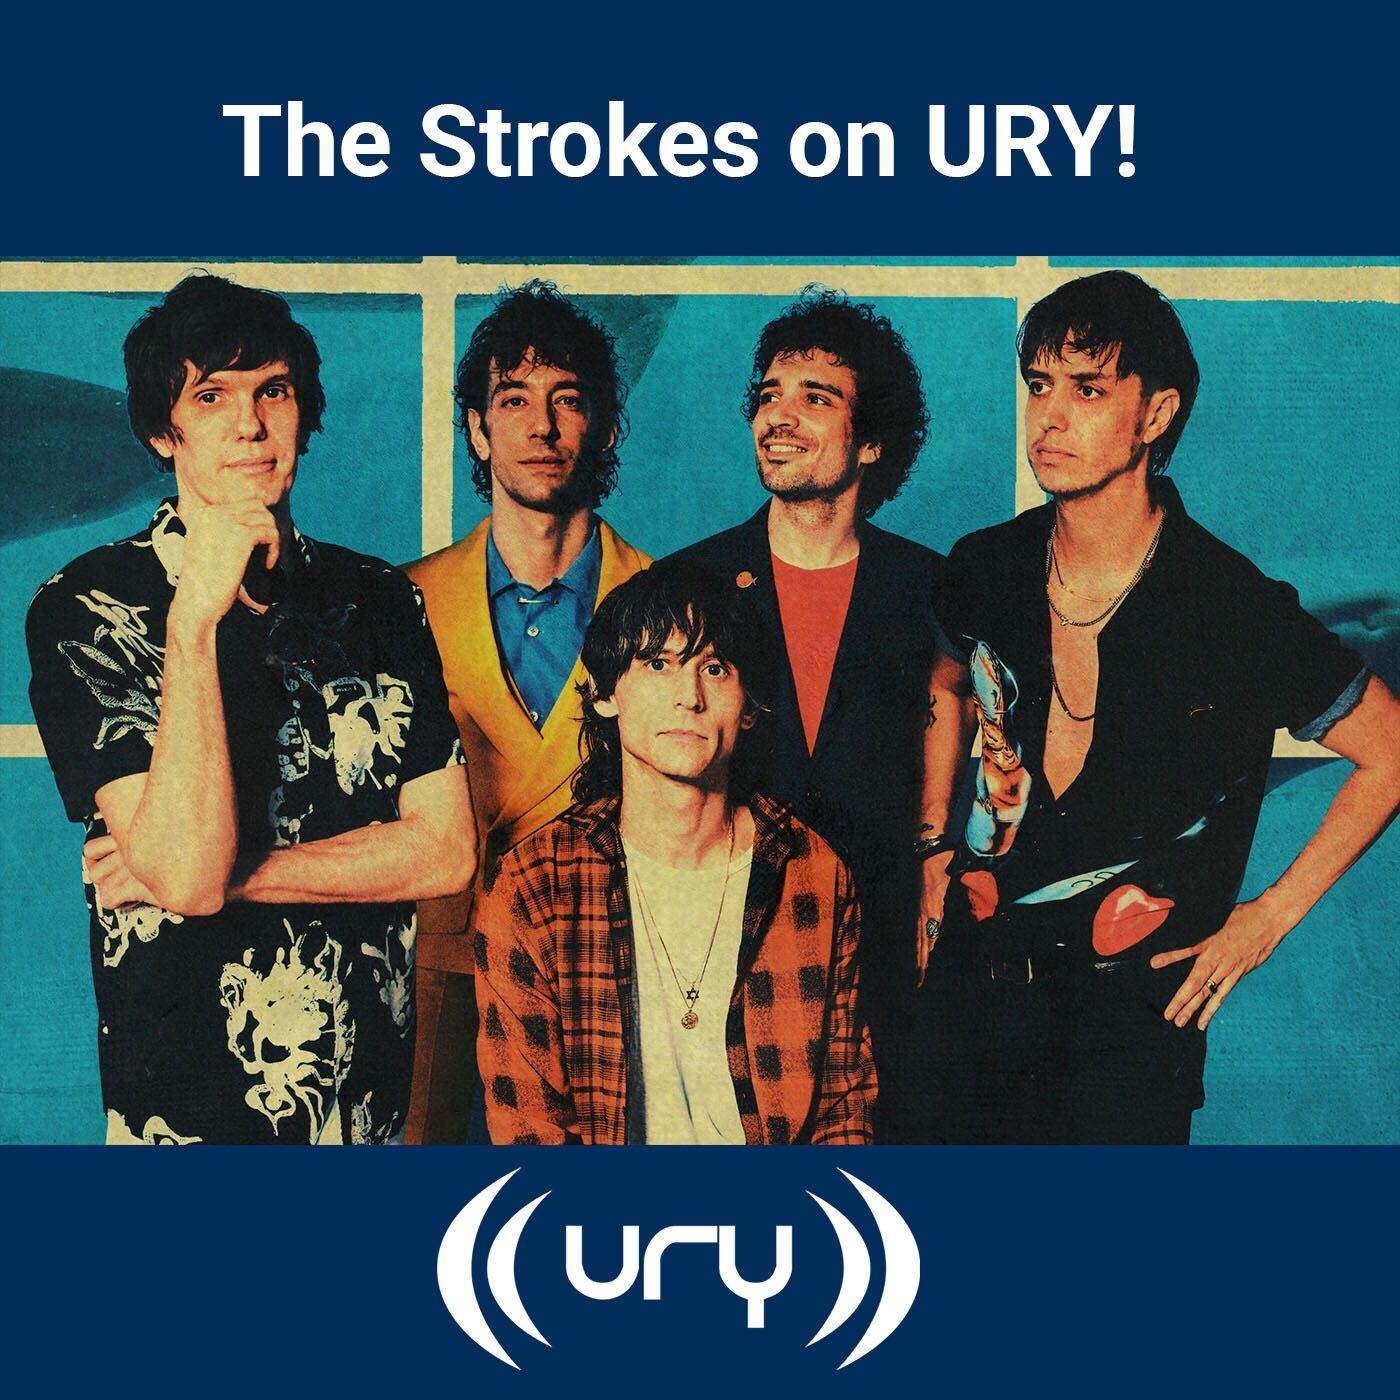 The Strokes on URY! Logo